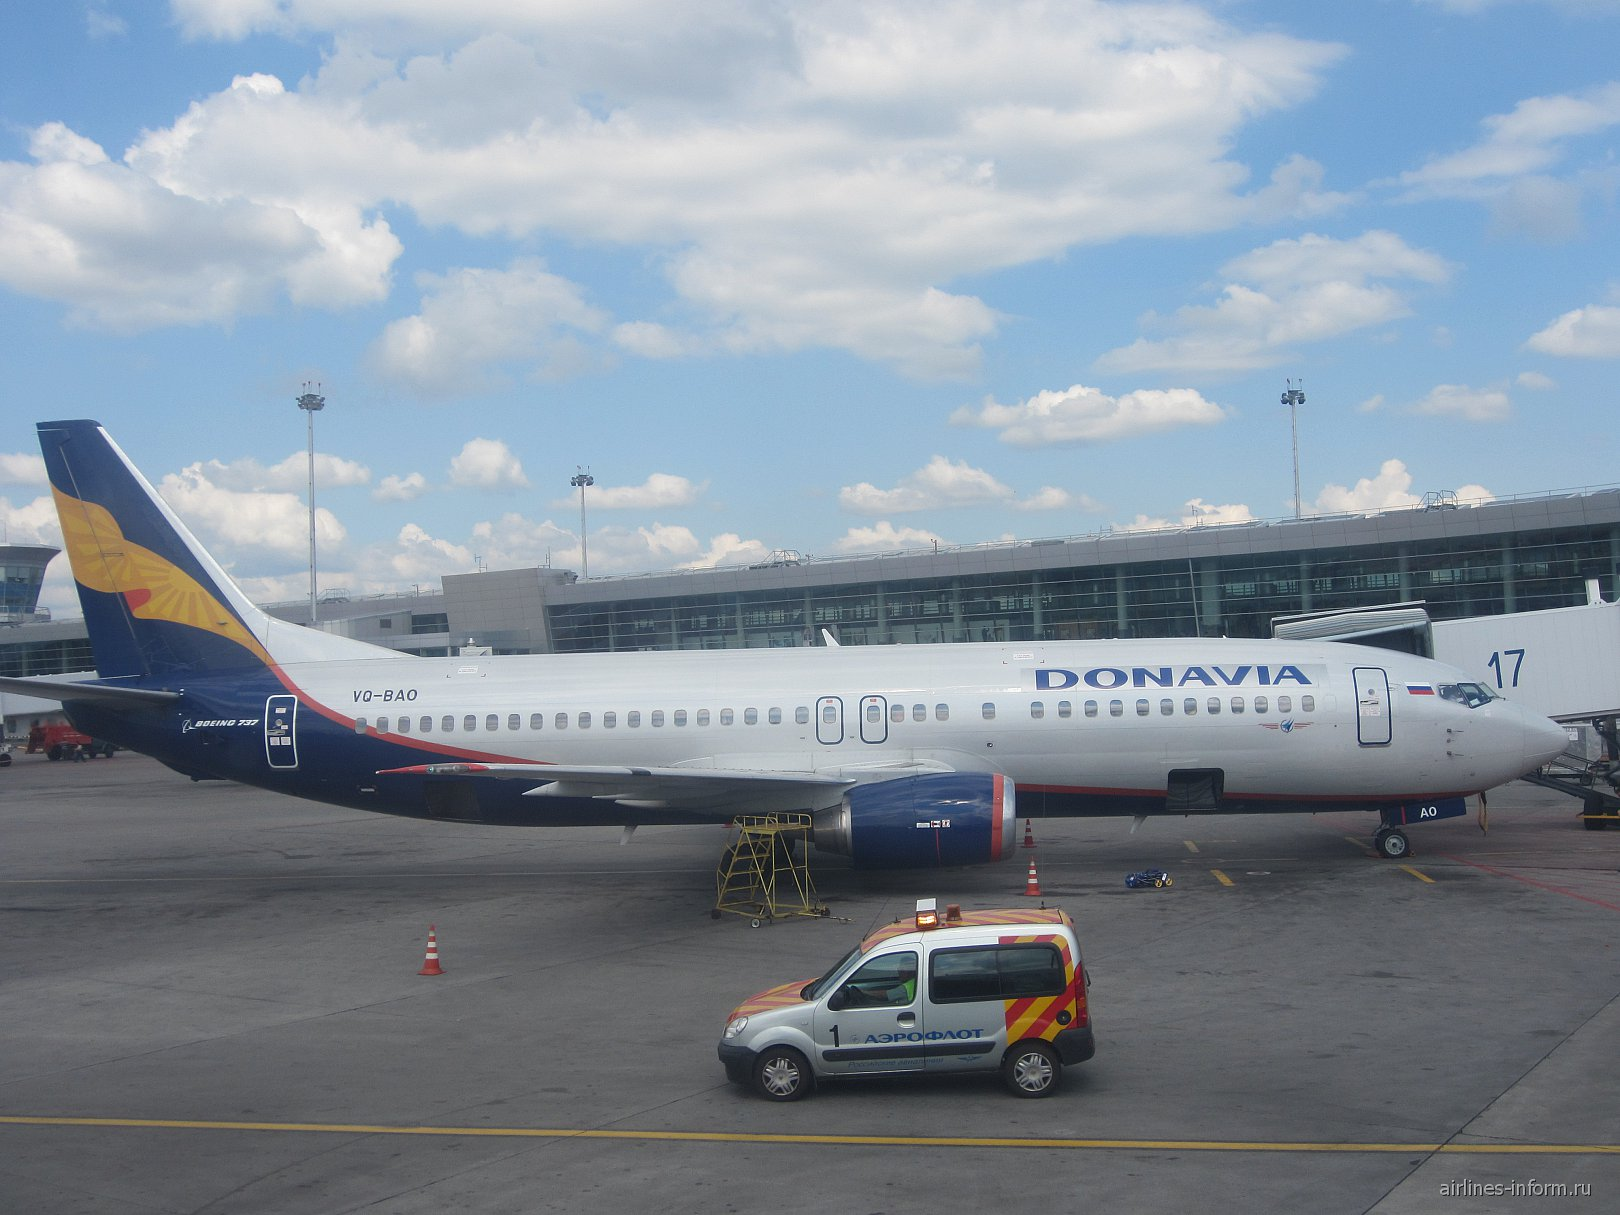 Боинг-737-400 VQ-BAO авиакомпании Донавиа в аэропорту Шереметьево